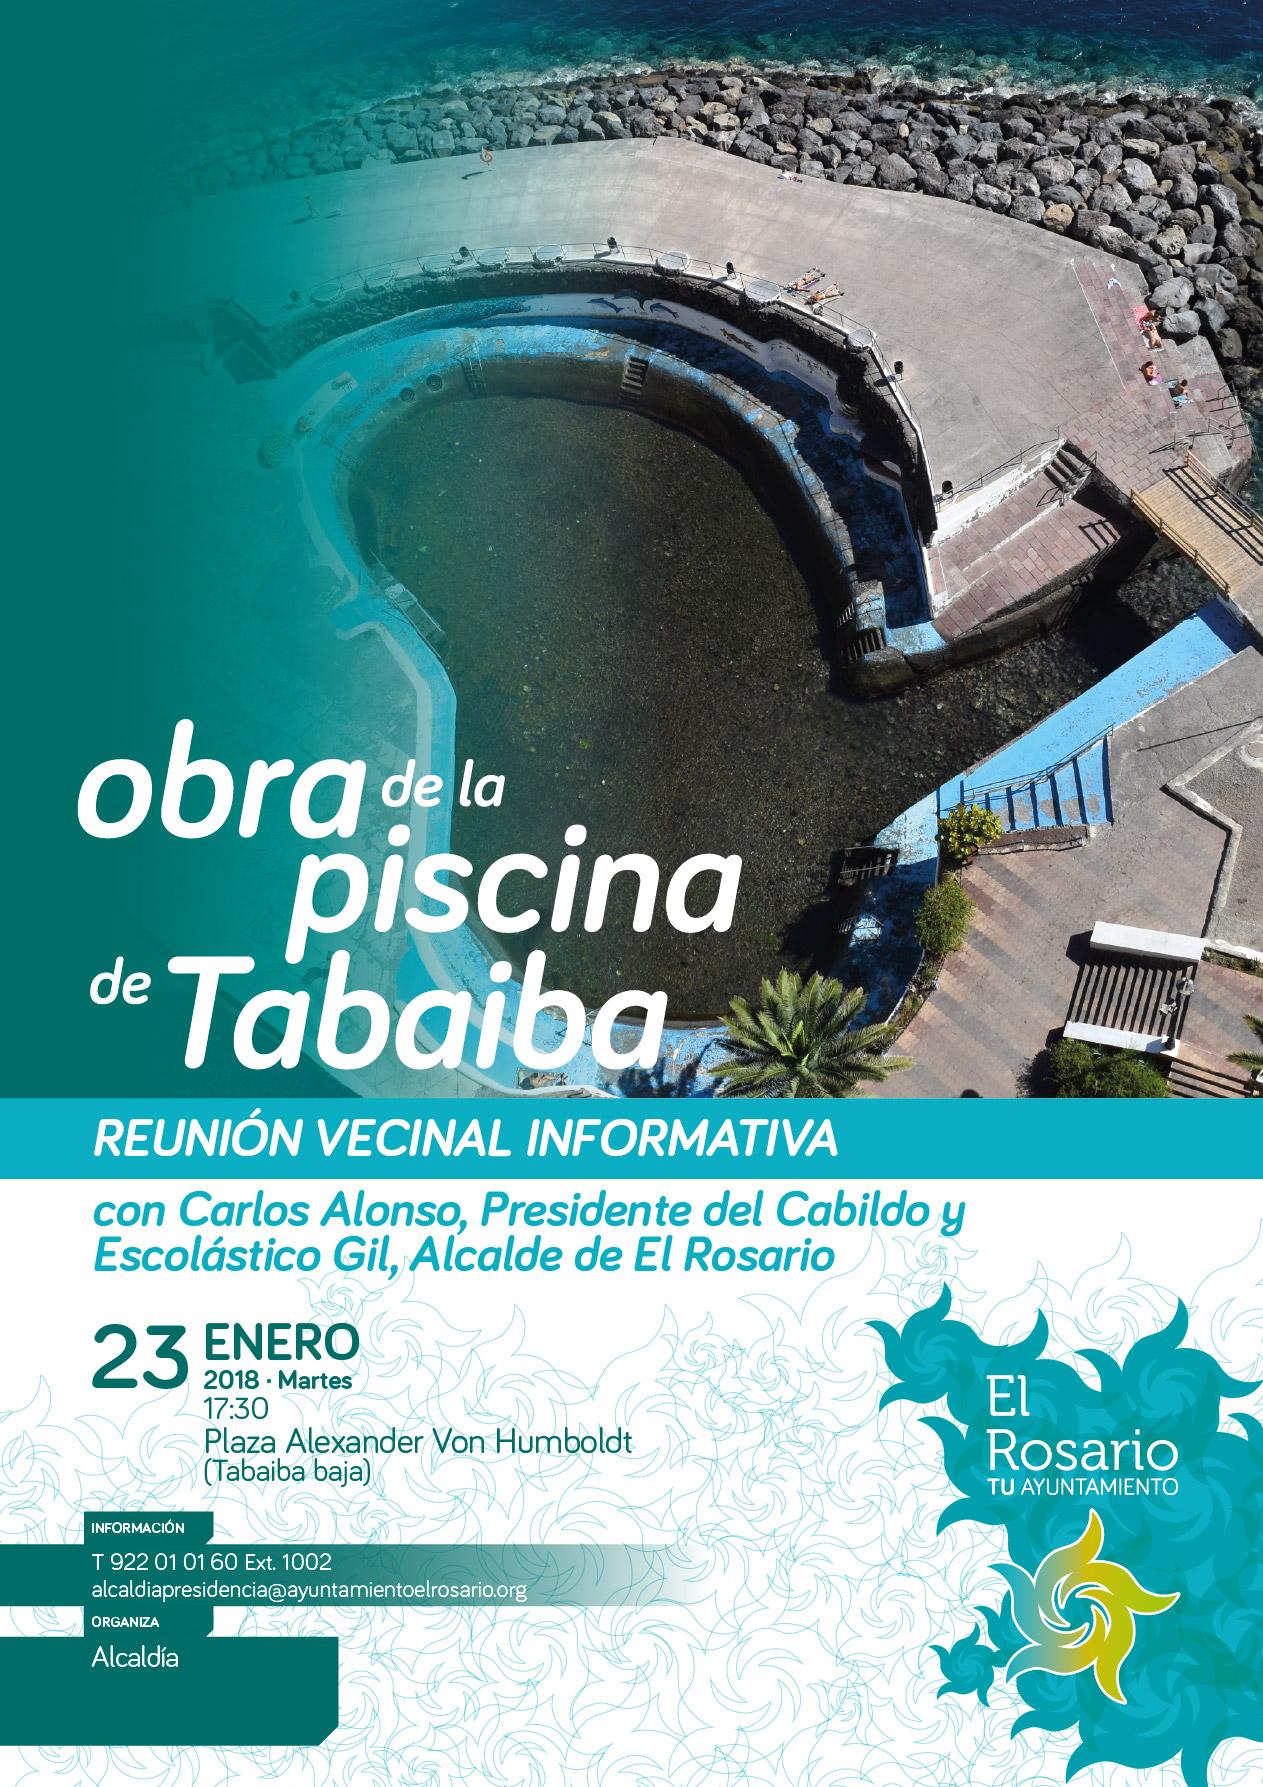 REUNION_INFORMATIVA_PISCINA_TABAIBA-CARTEL-20180123-01af-redes